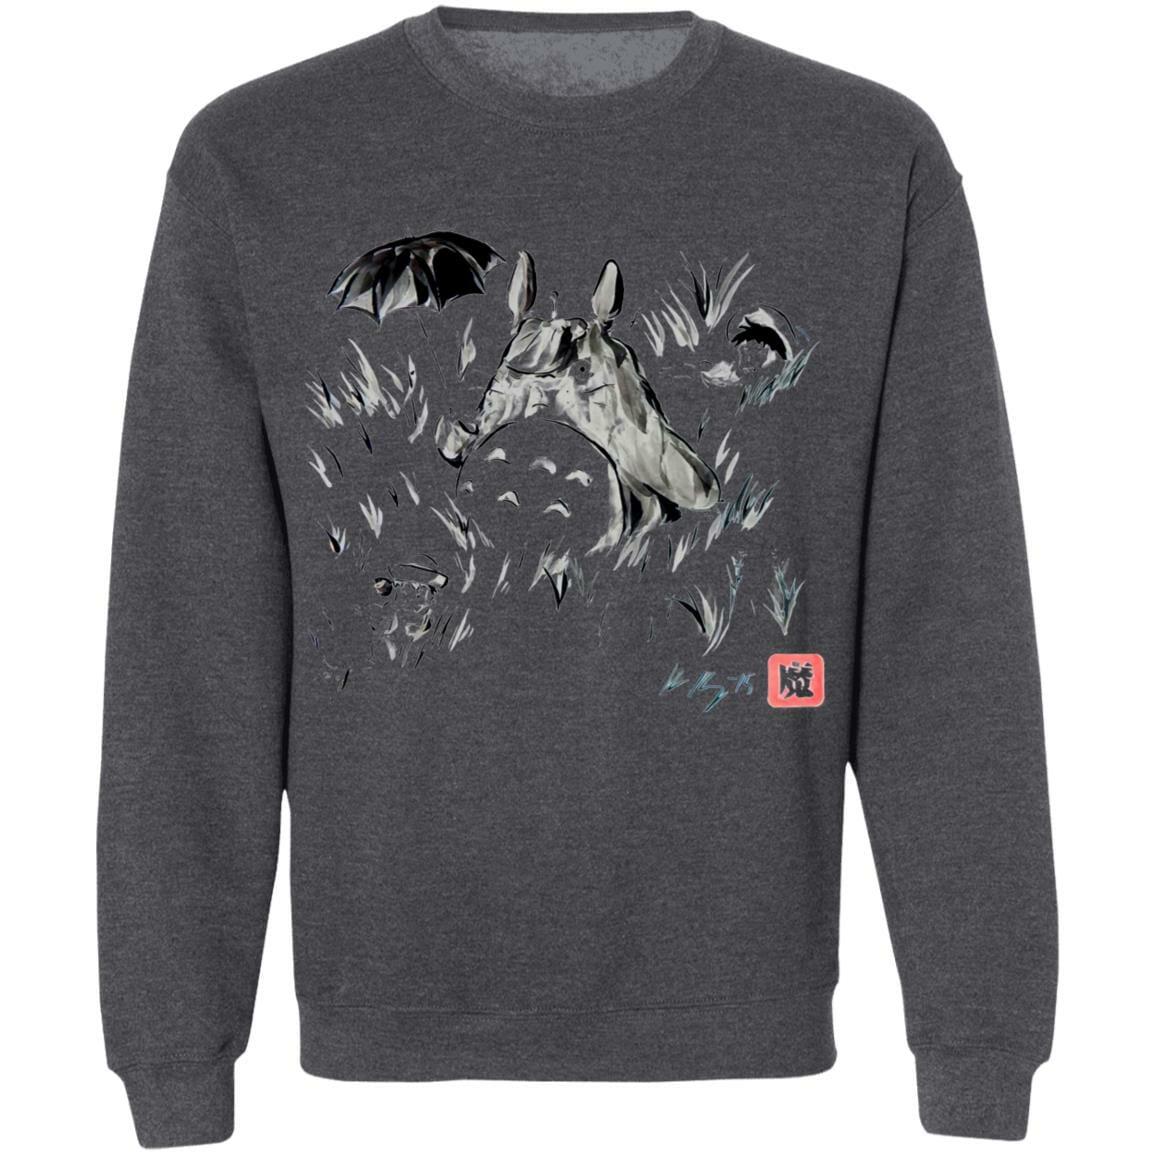 Totoro And The Girls Ink Painting Sweatshirt